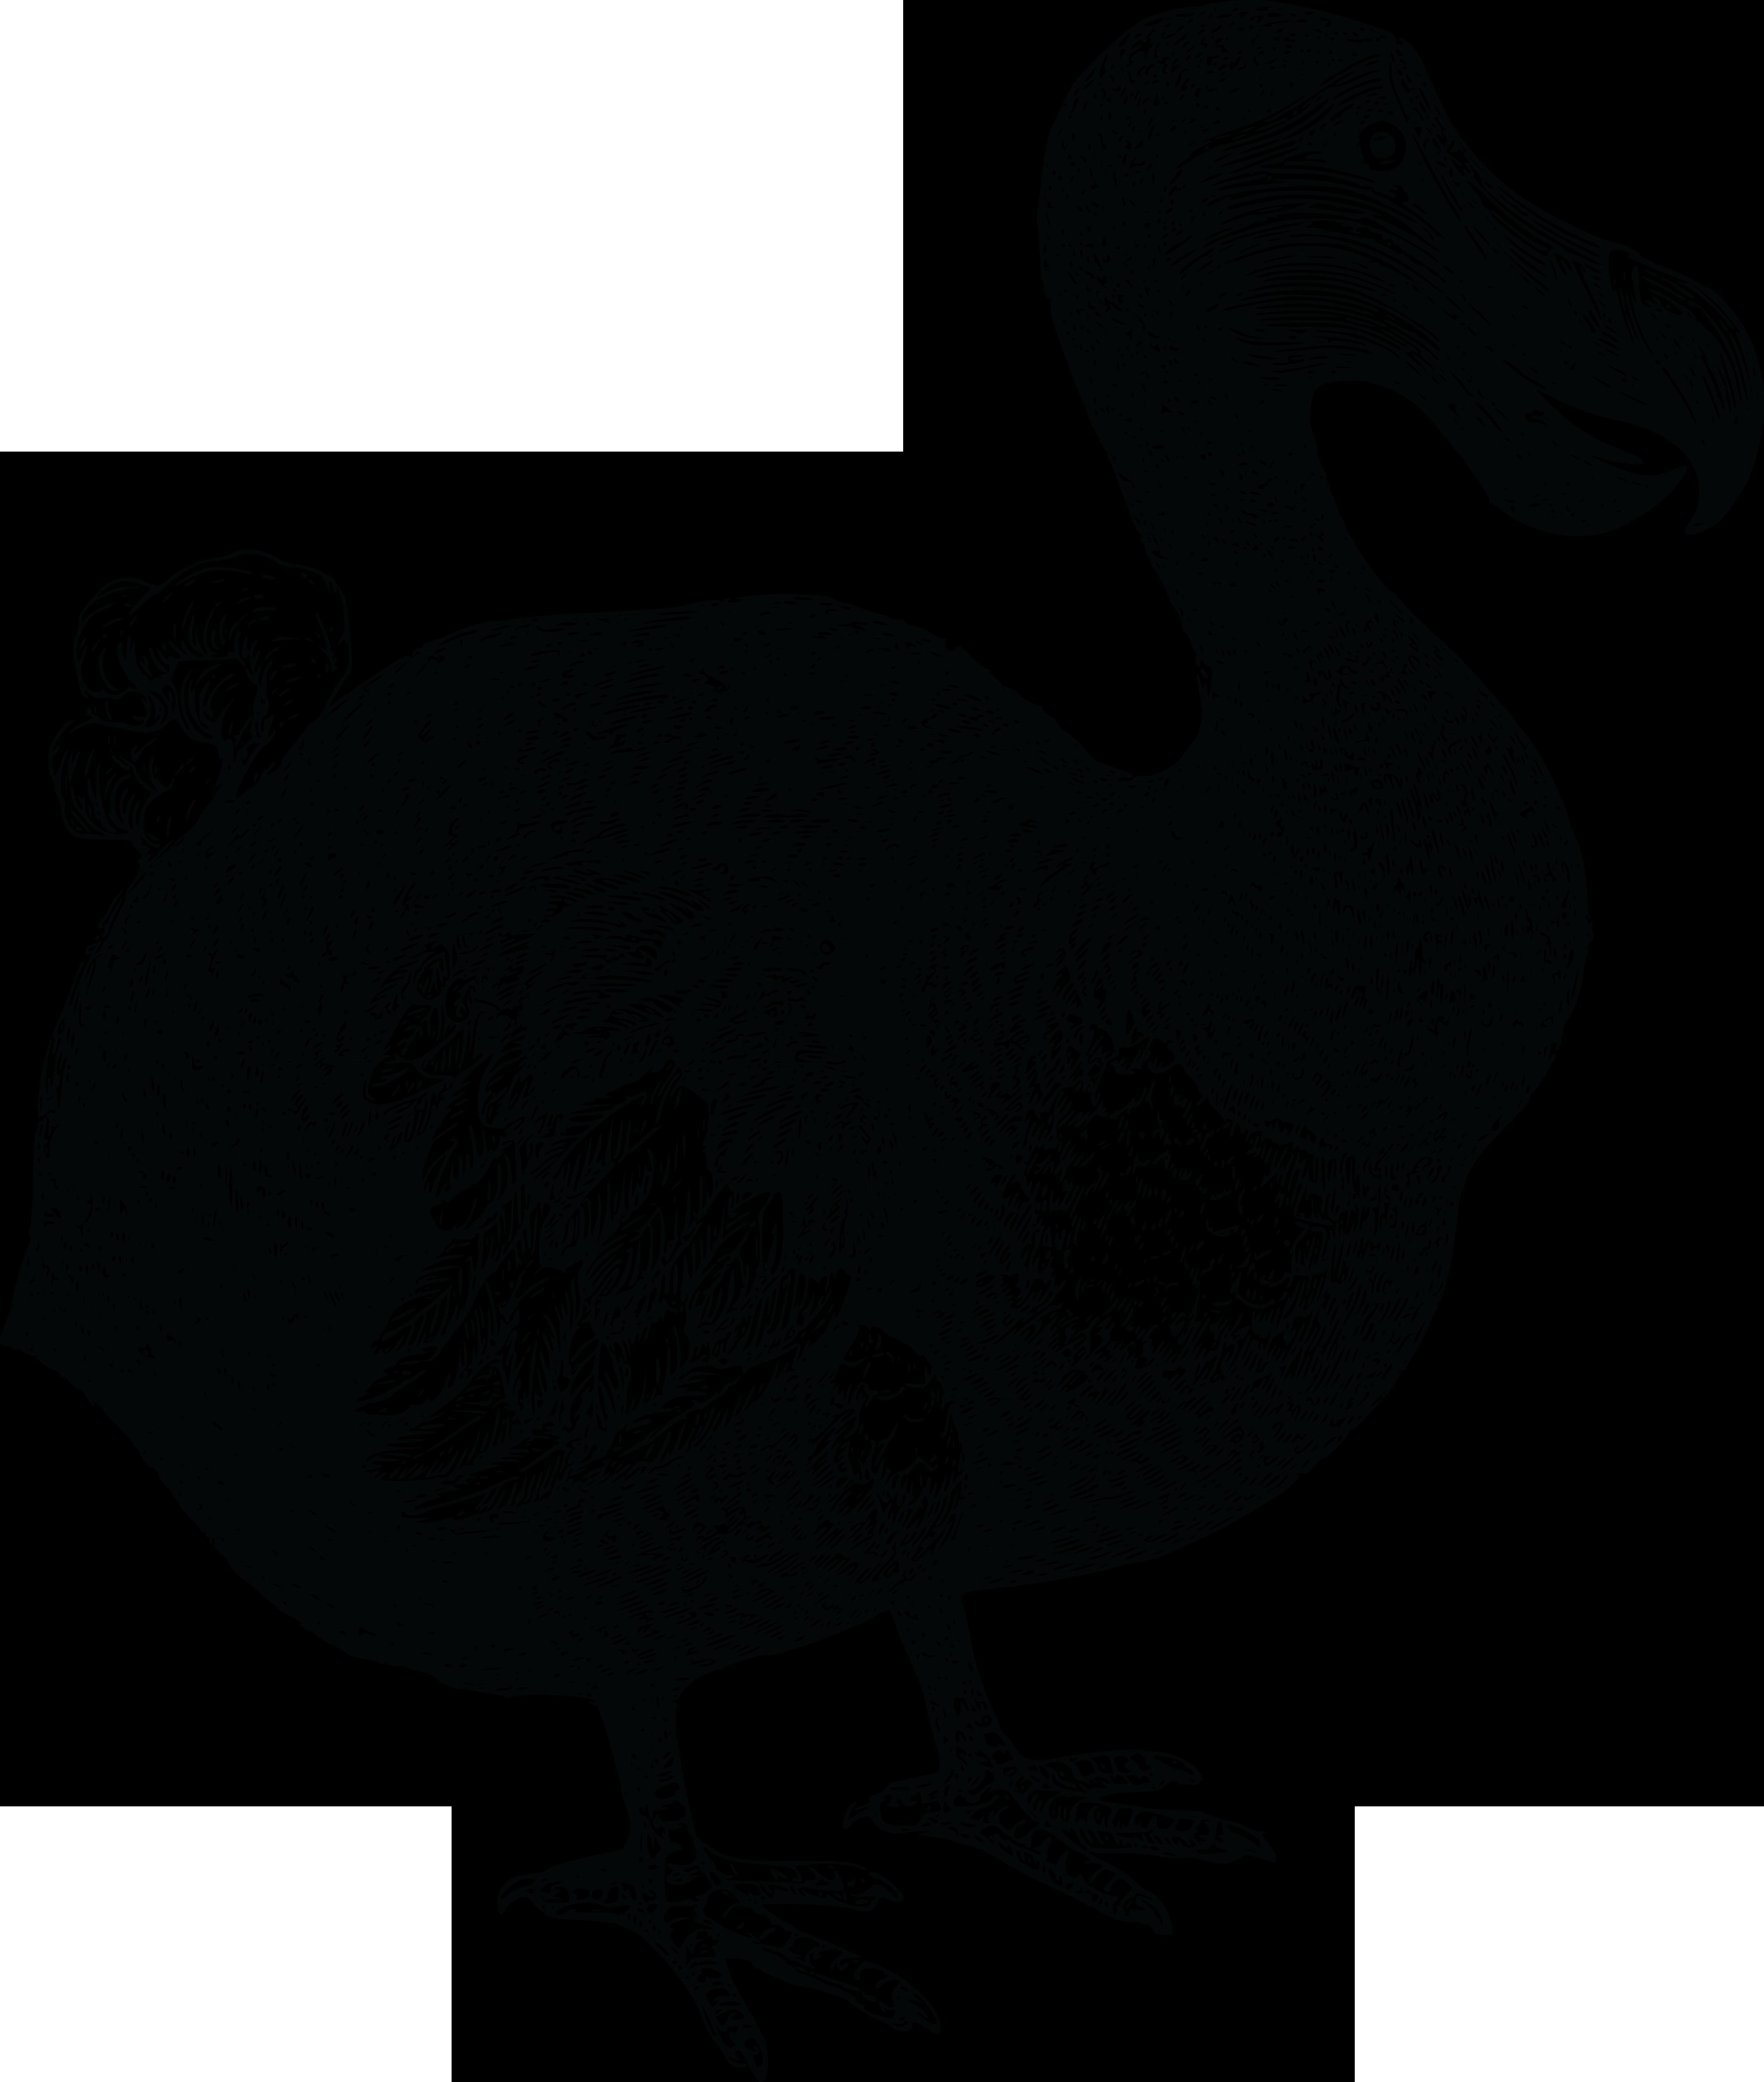 free clipart of a dodo bird Pilgrim Turkey Female Pilgrim Serving Turkey Dinner